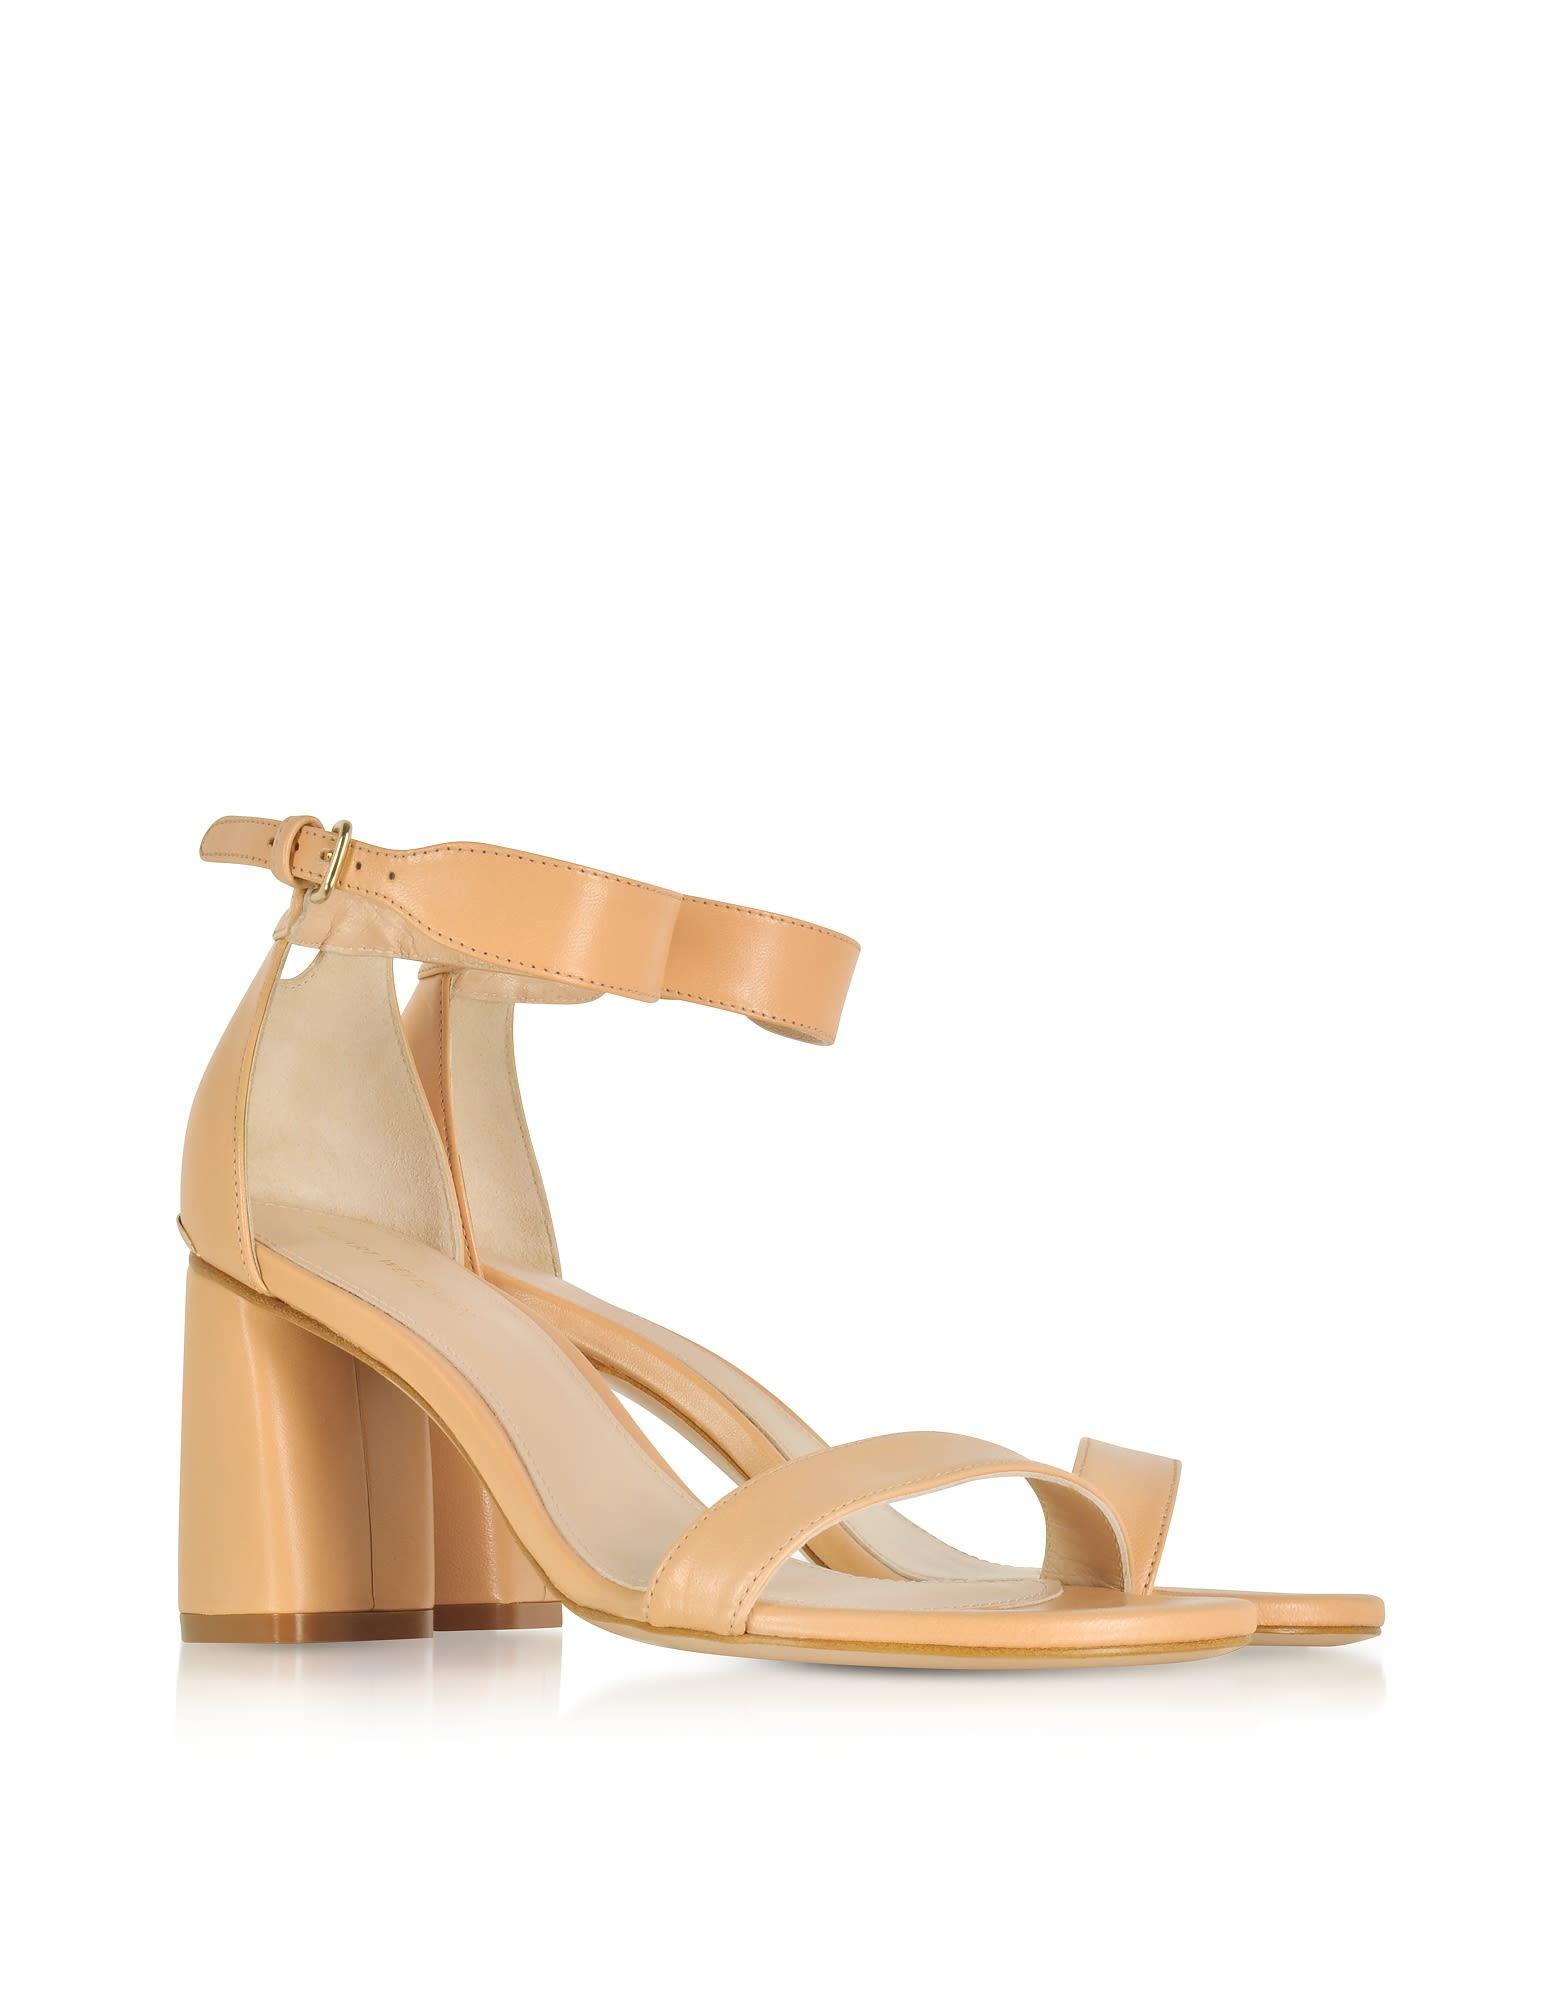 Stuart Weitzman Designer Shoes, Partlynude Nude Nappa Leather Heel Sandals